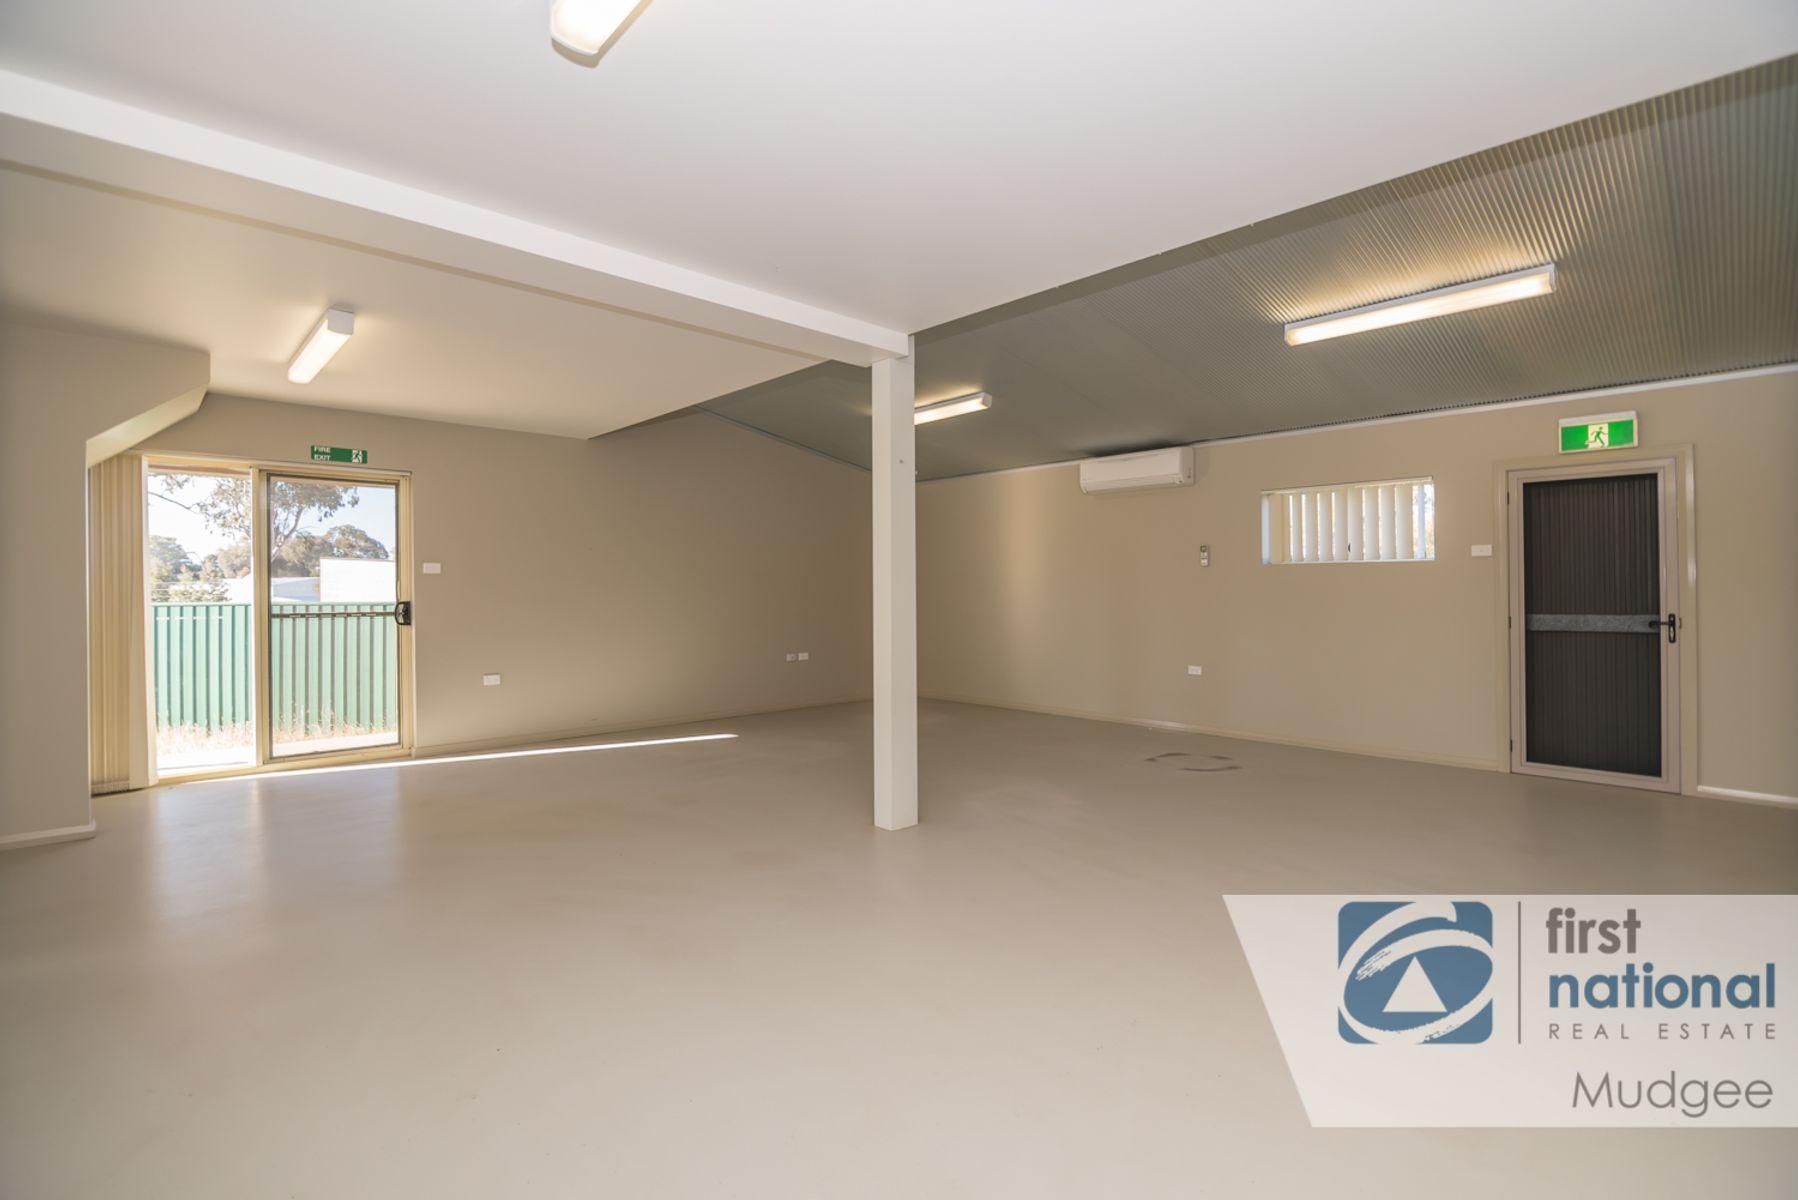 16 Swords Court, Mudgee, NSW 2850